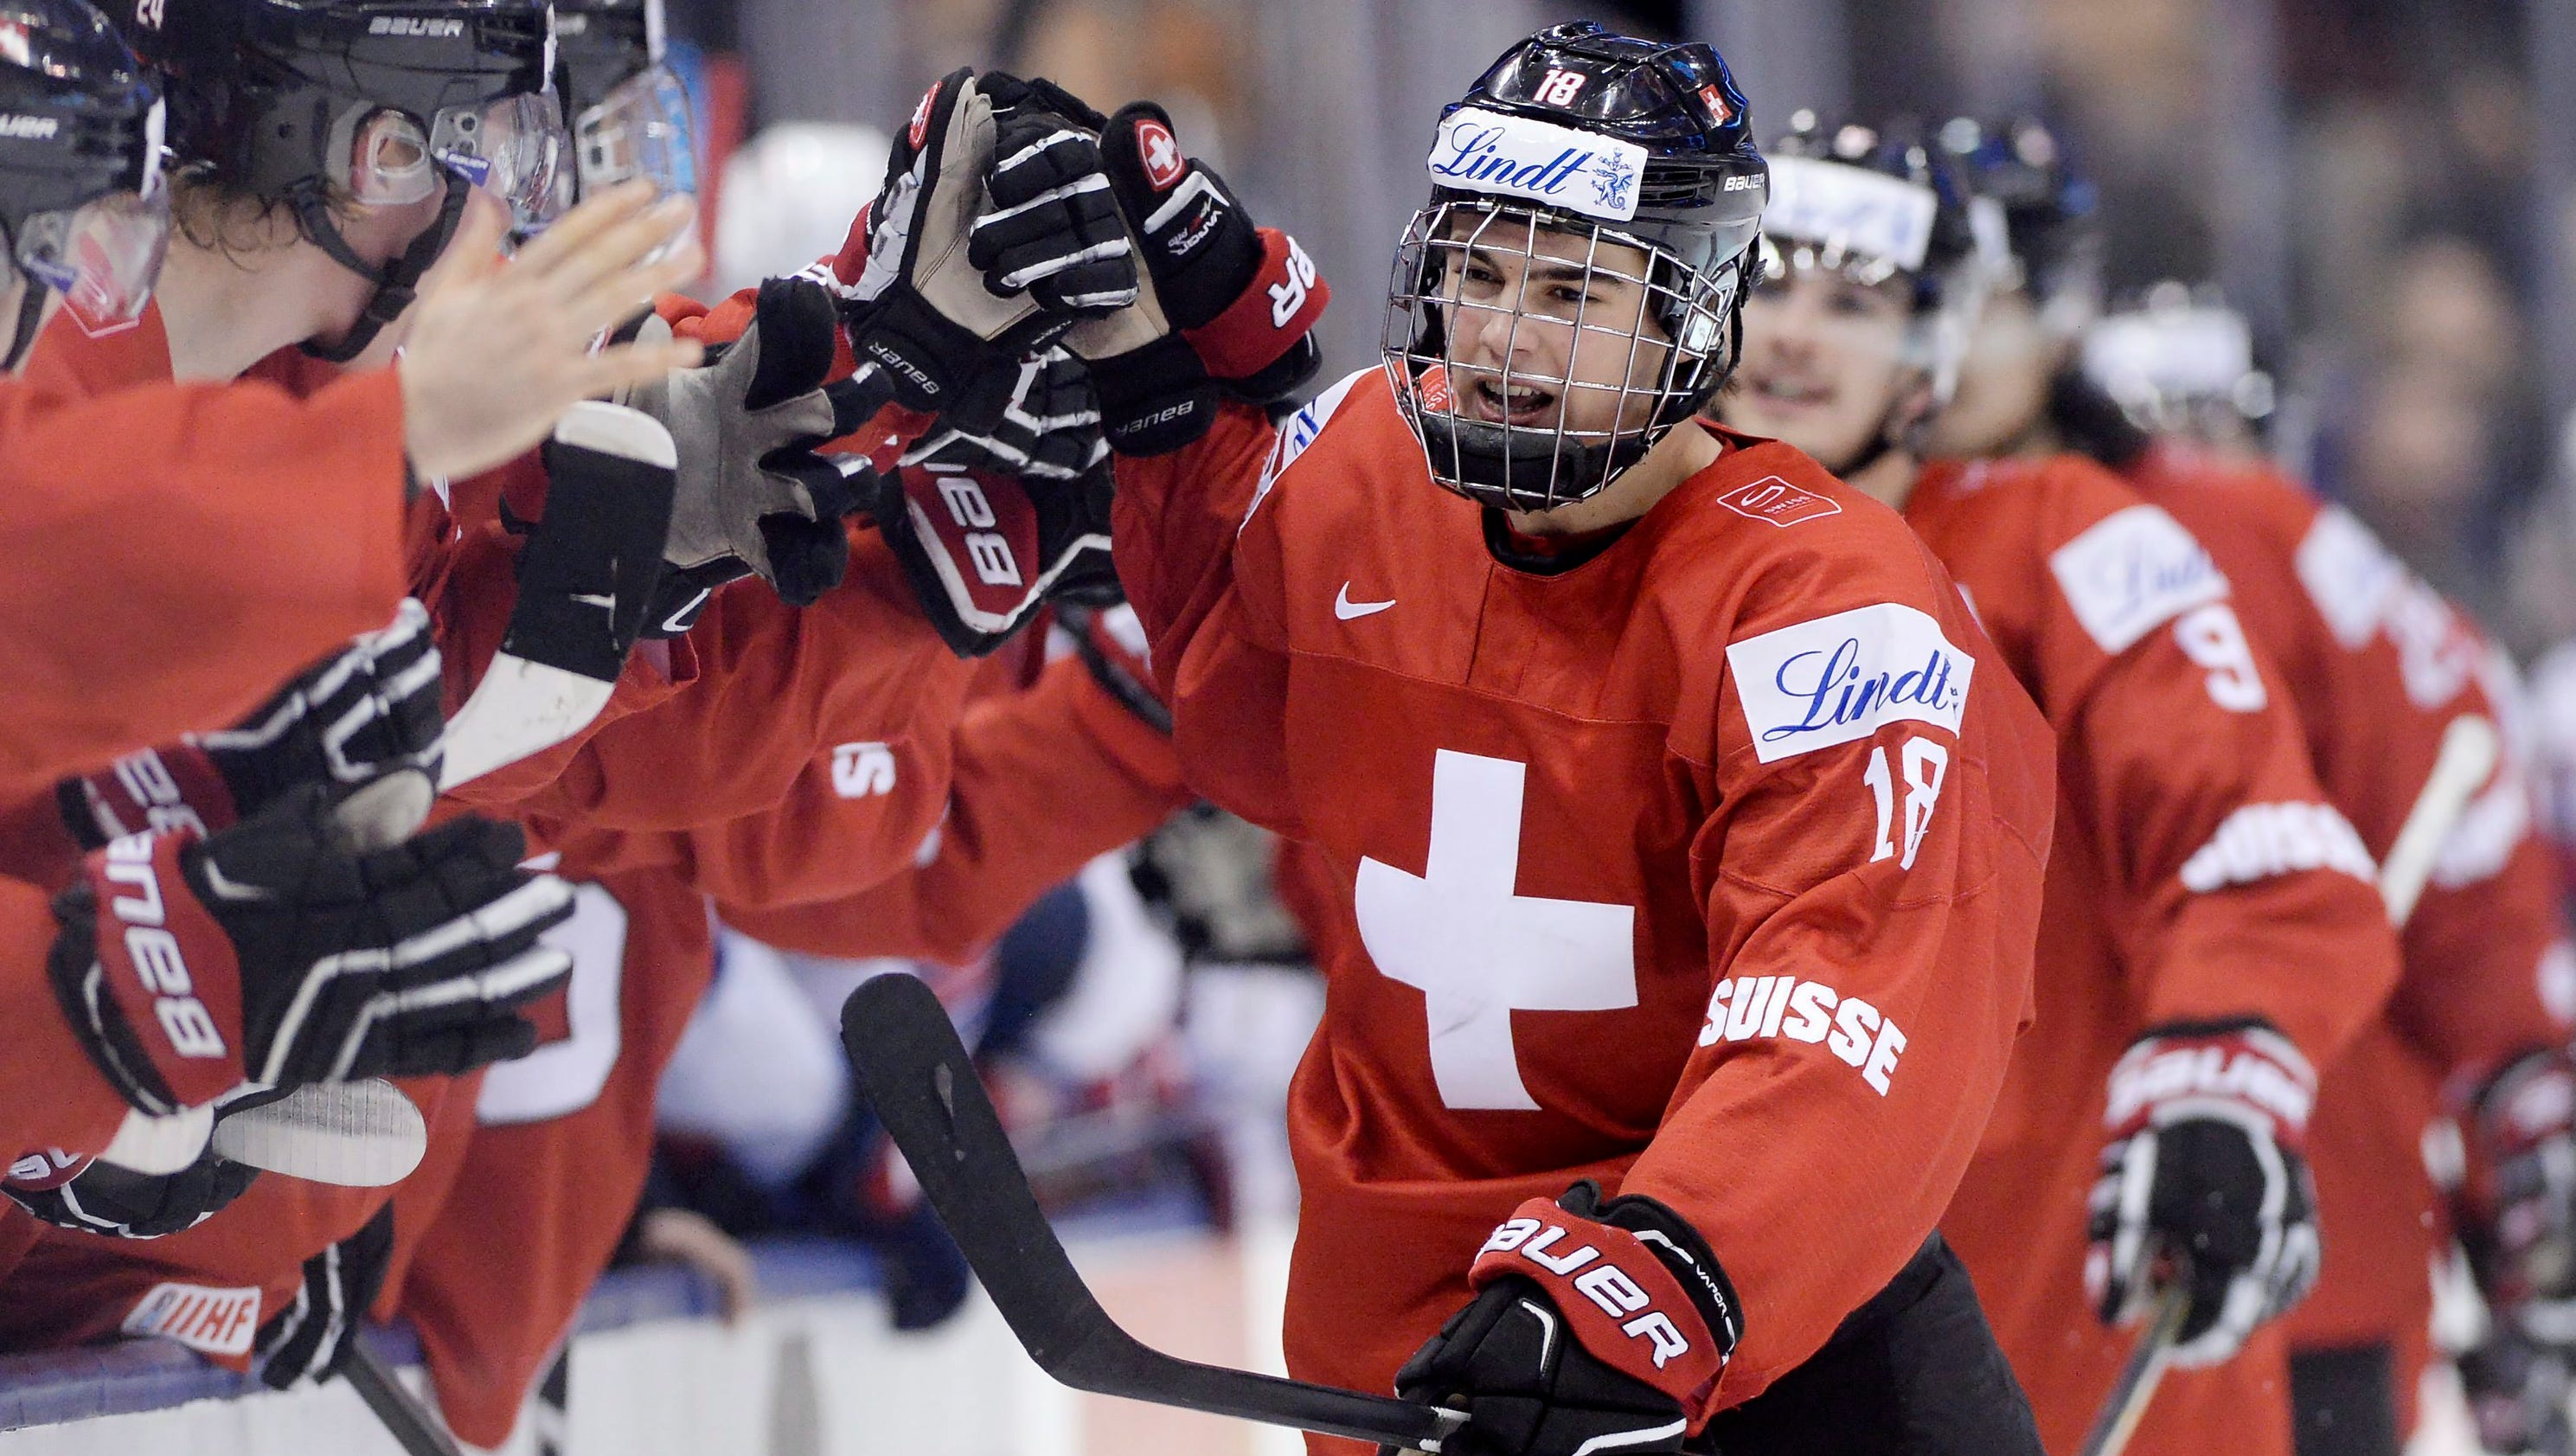 636208400038072214-ap-world-junior-switzerland-united-states-hockey